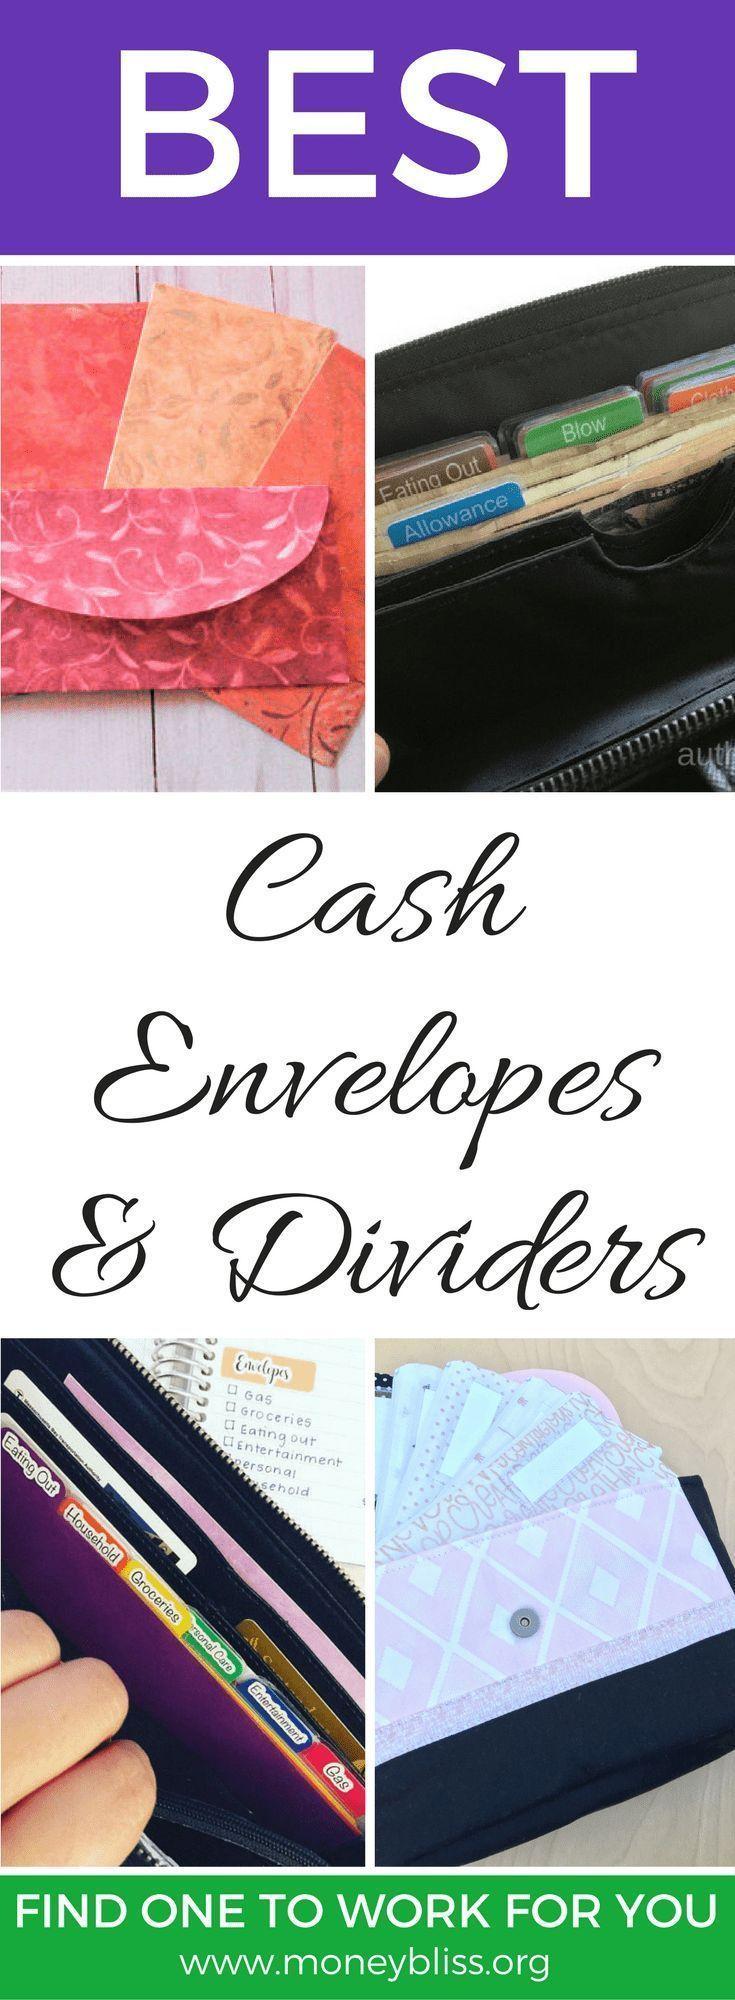 Best Cash Envelopes for Budgeting – Pick Your Favorite